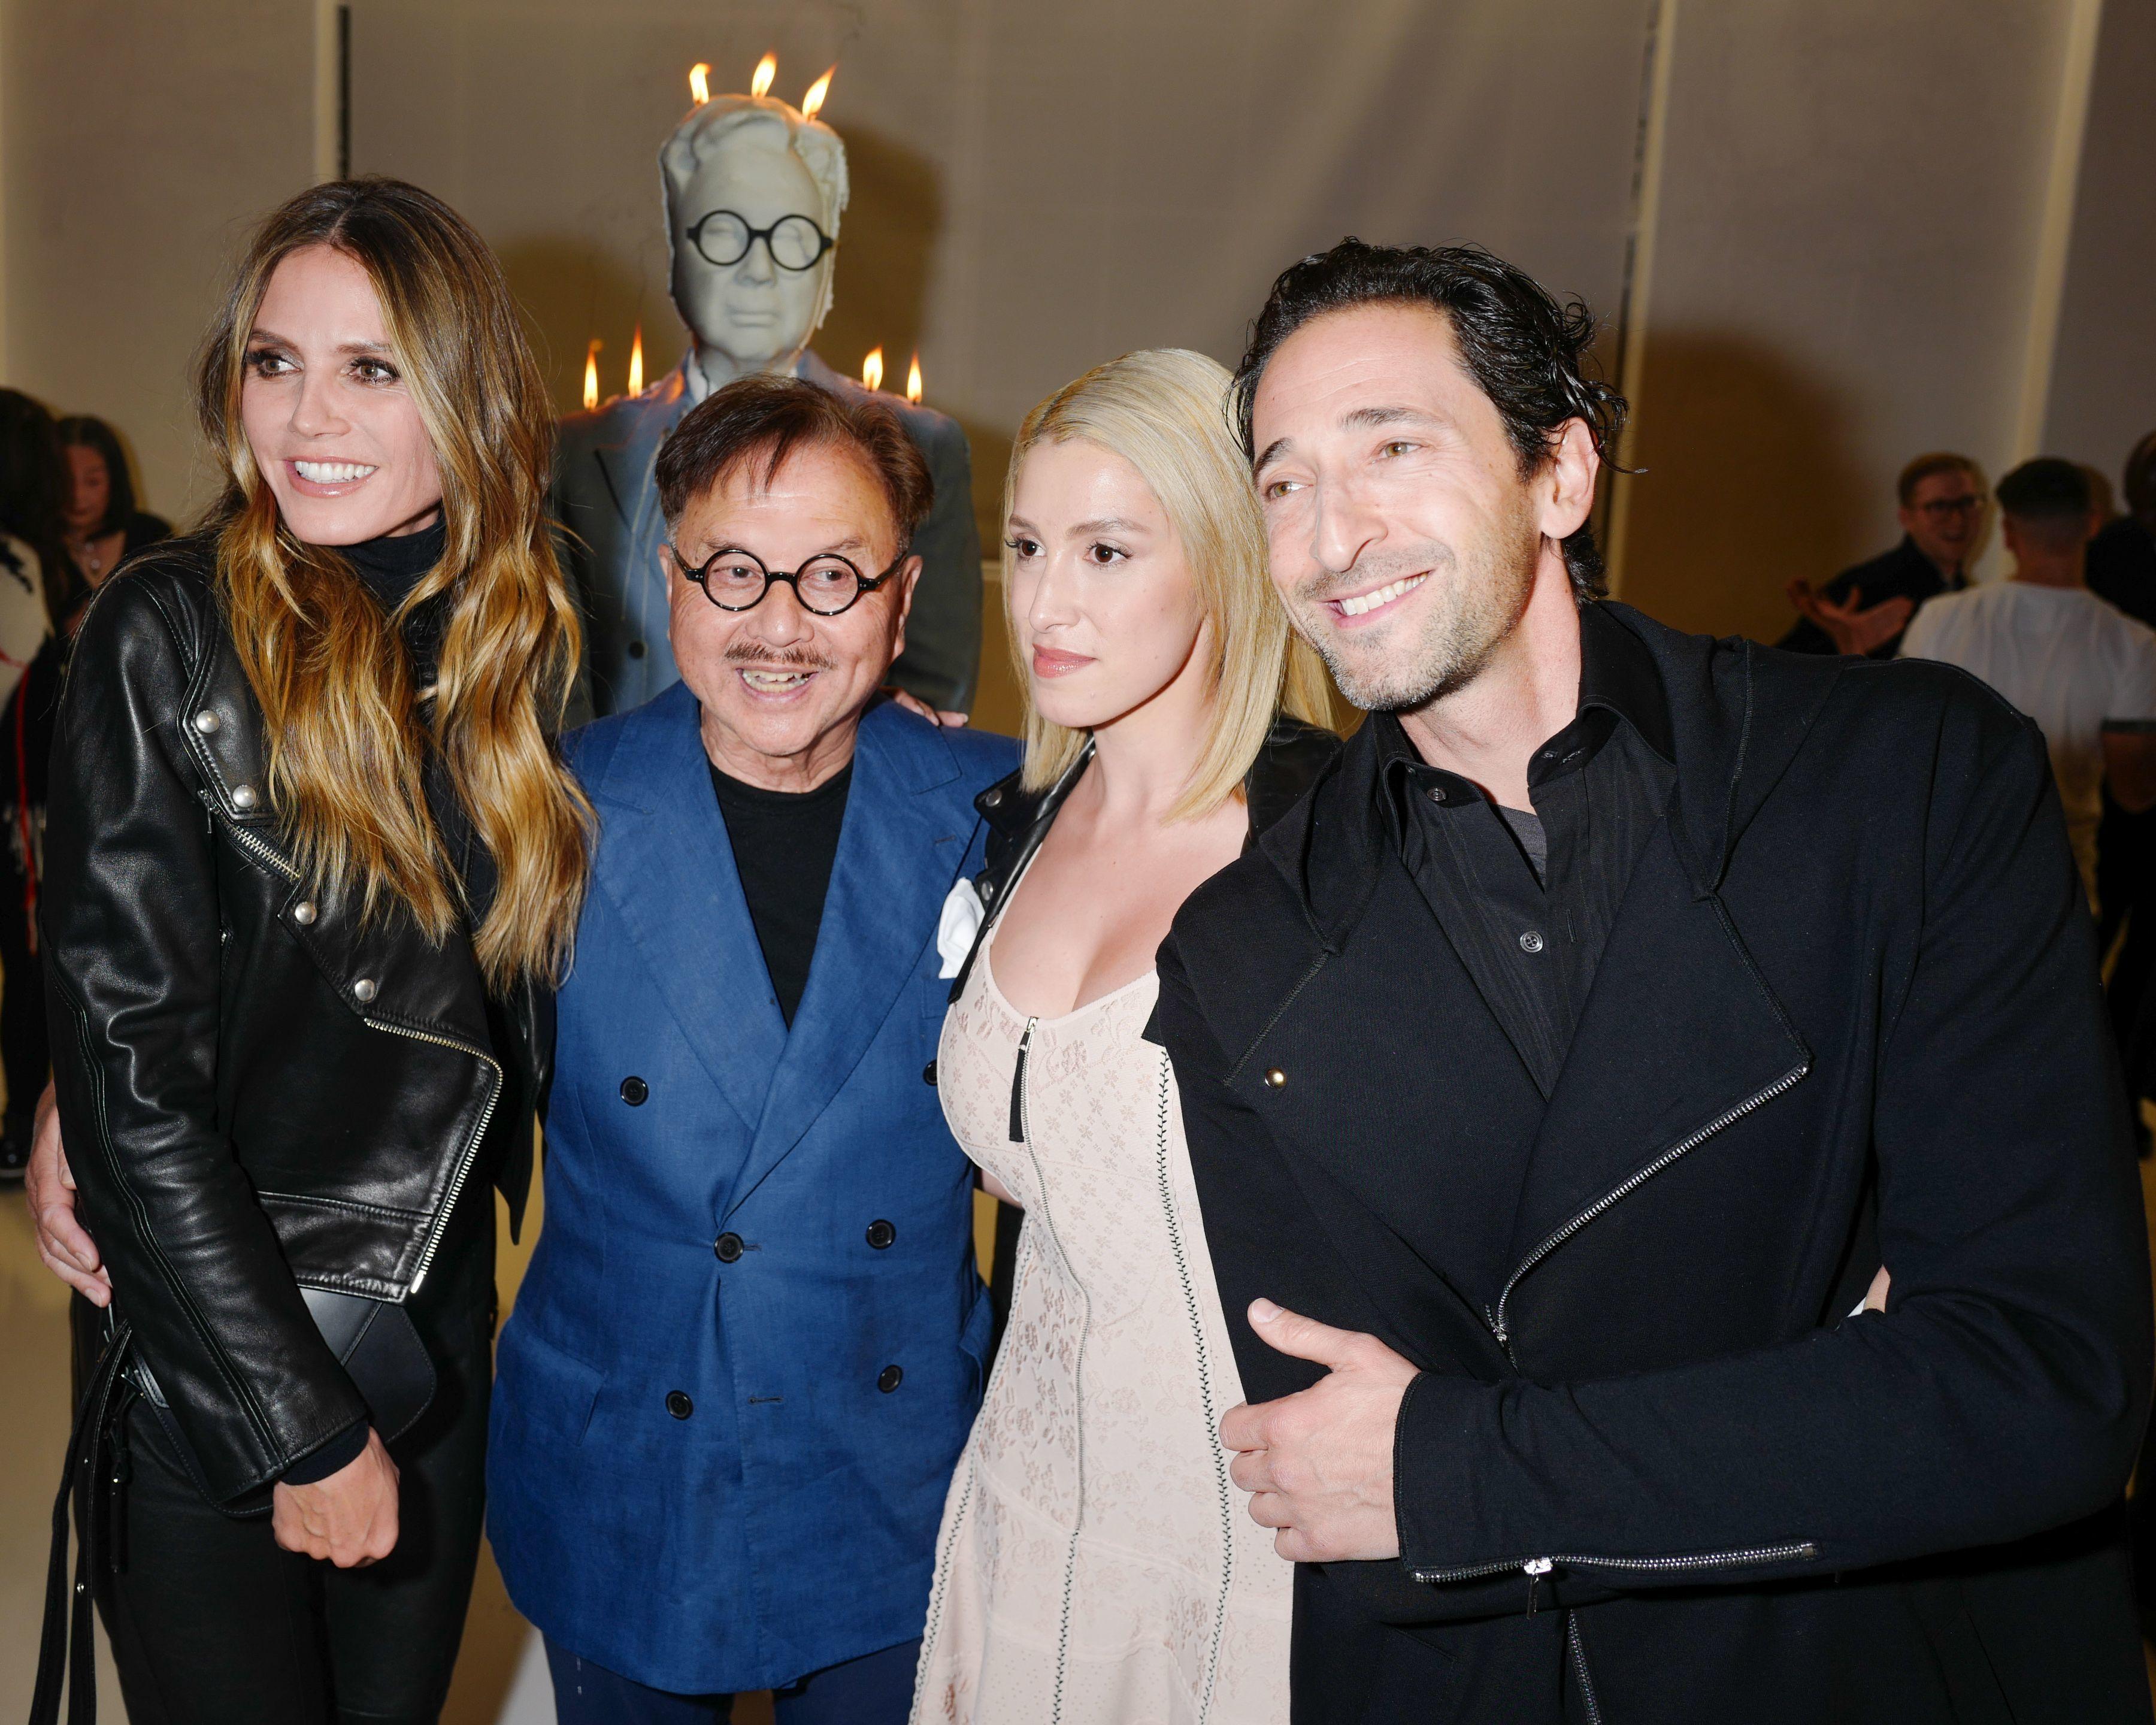 Heidi Klum, Michael Chow, Vanessa Rano Adrien Brody attend the Mr Chow 50th Anniversary celebration in Los Angeles on Feb. 16, 2018.